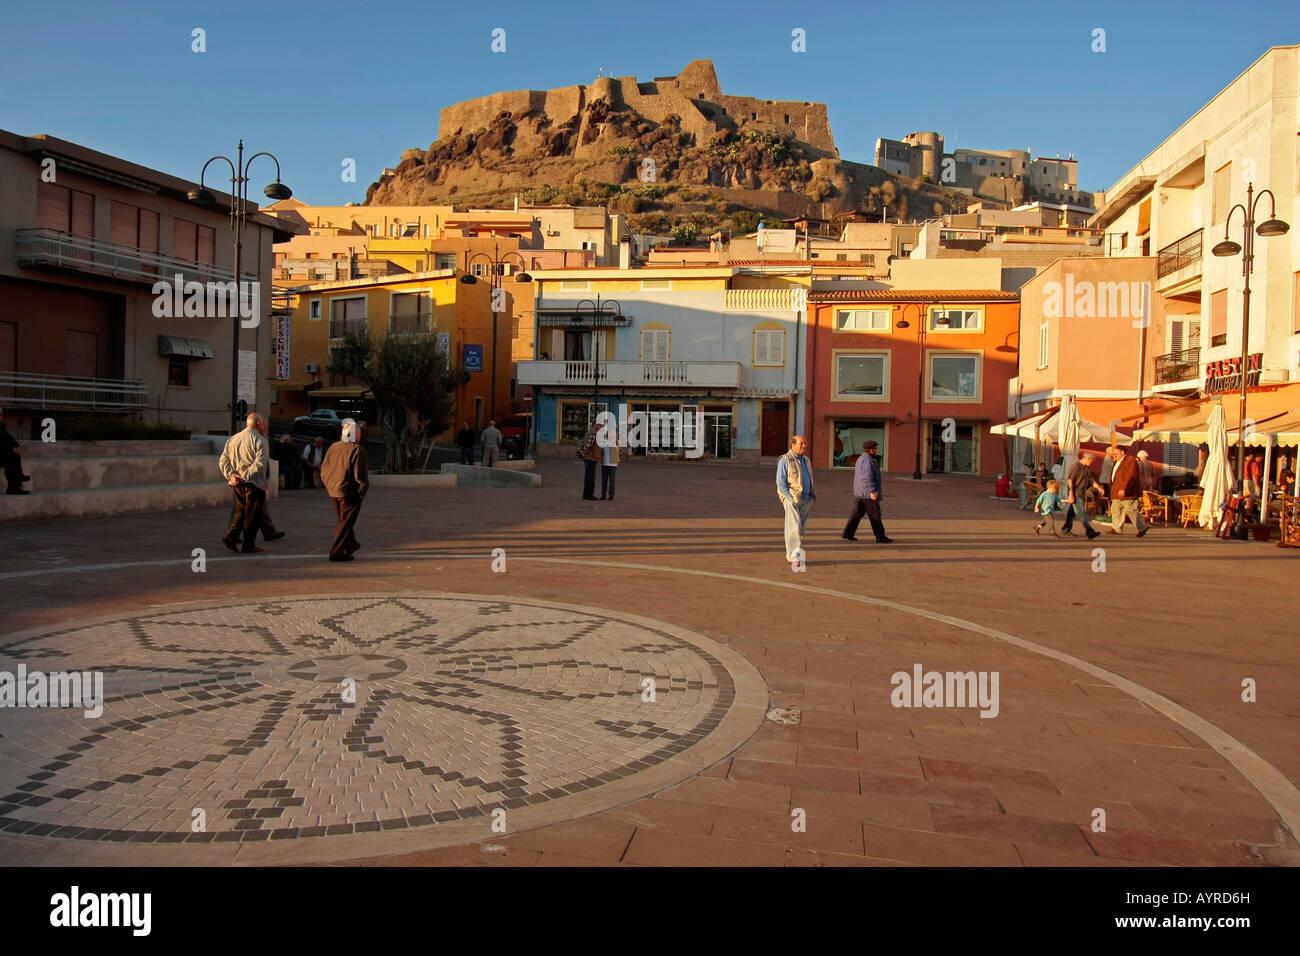 Market square in Castelsardo, Sardinia, Italy Stock Photo